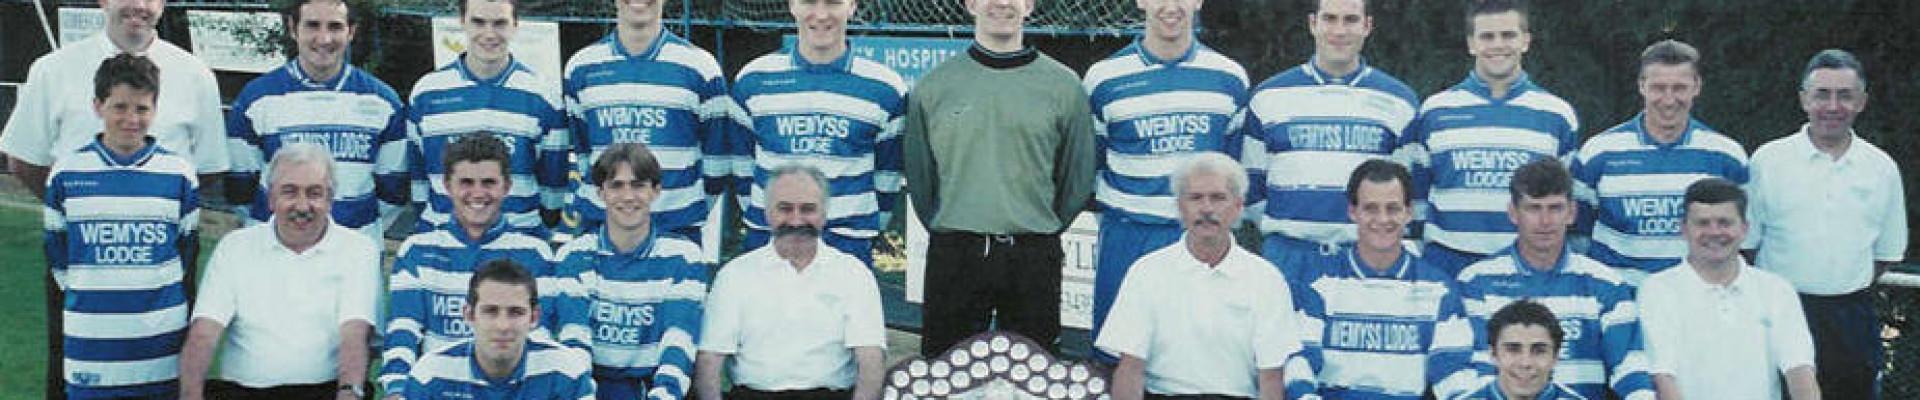 Team Photo 2001/02 Season